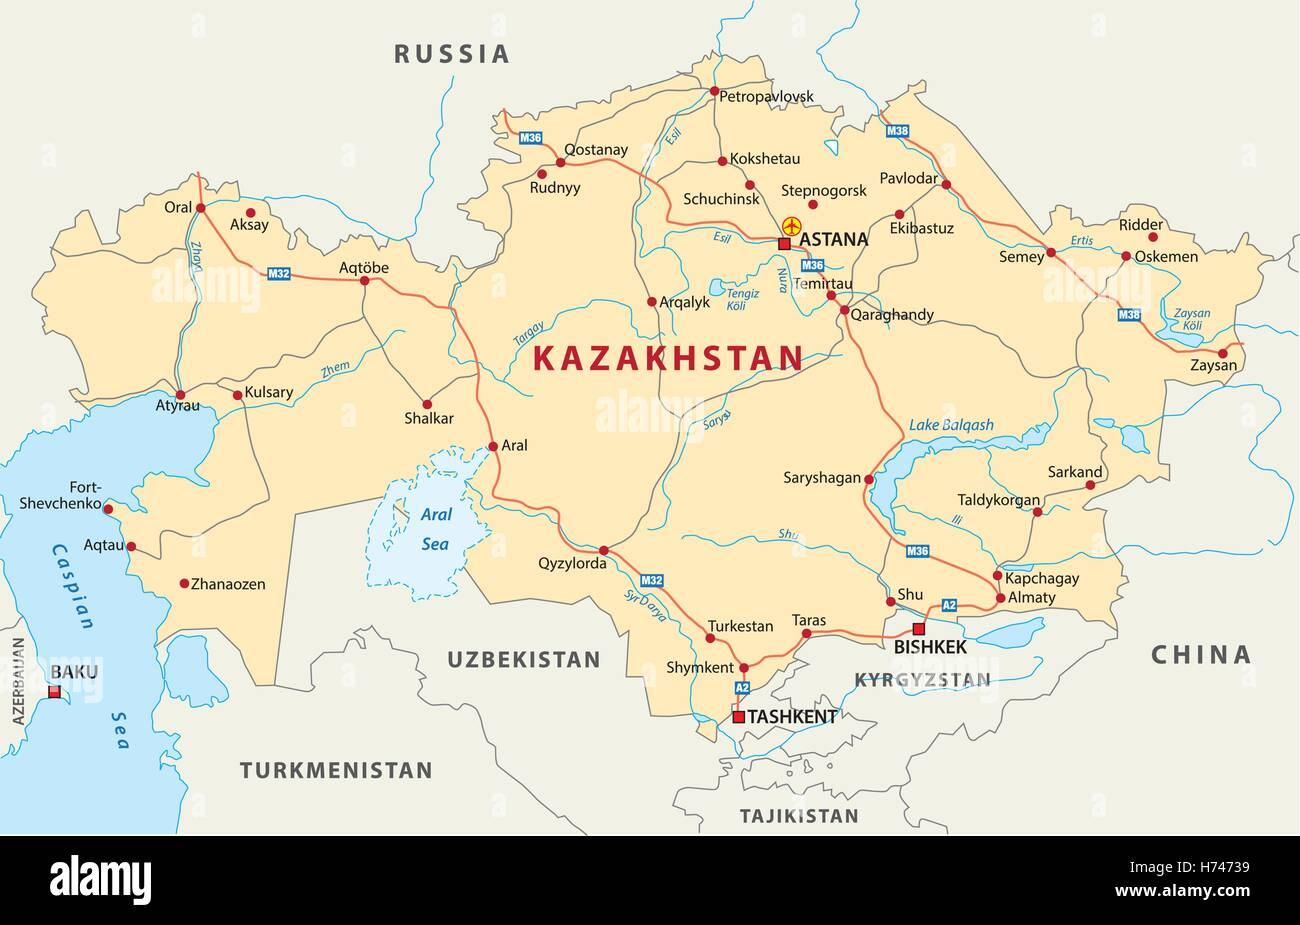 Kazakhstan Russia Map.Border Russia Kazakhstan Stock Photos Border Russia Kazakhstan